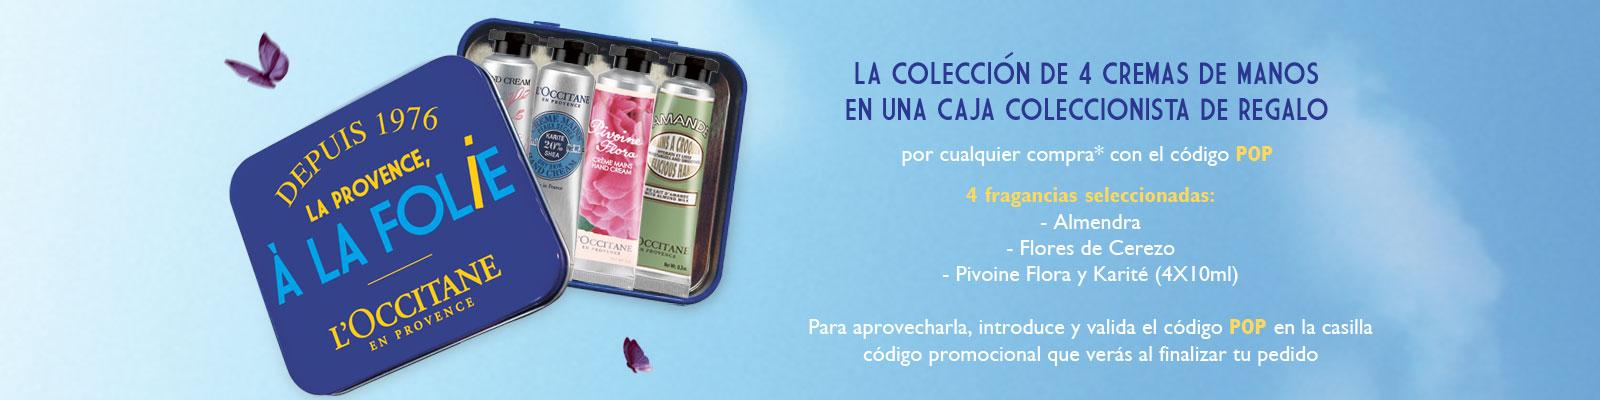 Caja Collector - L'Occitane en Provence